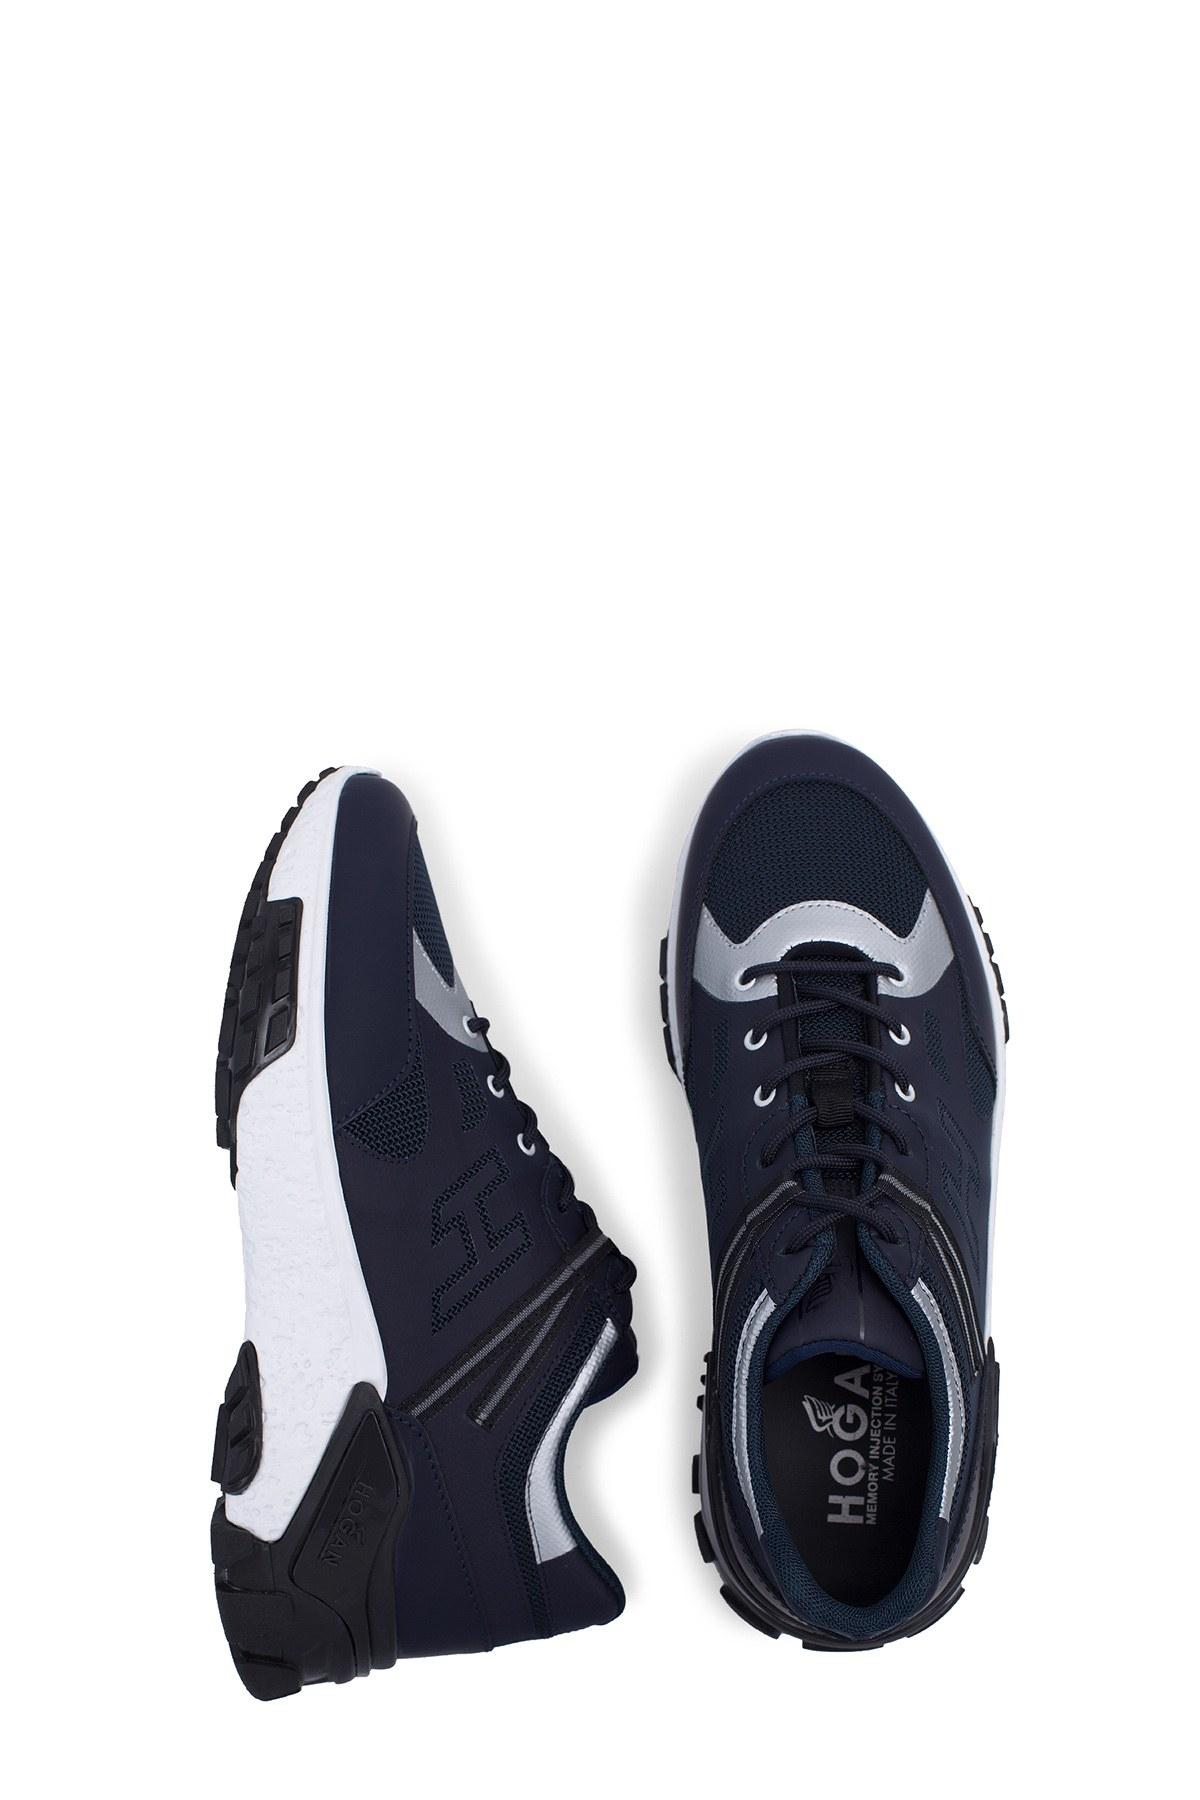 Hogan Erkek Ayakkabı HXM4770CQ90NC62318 LACİVERT